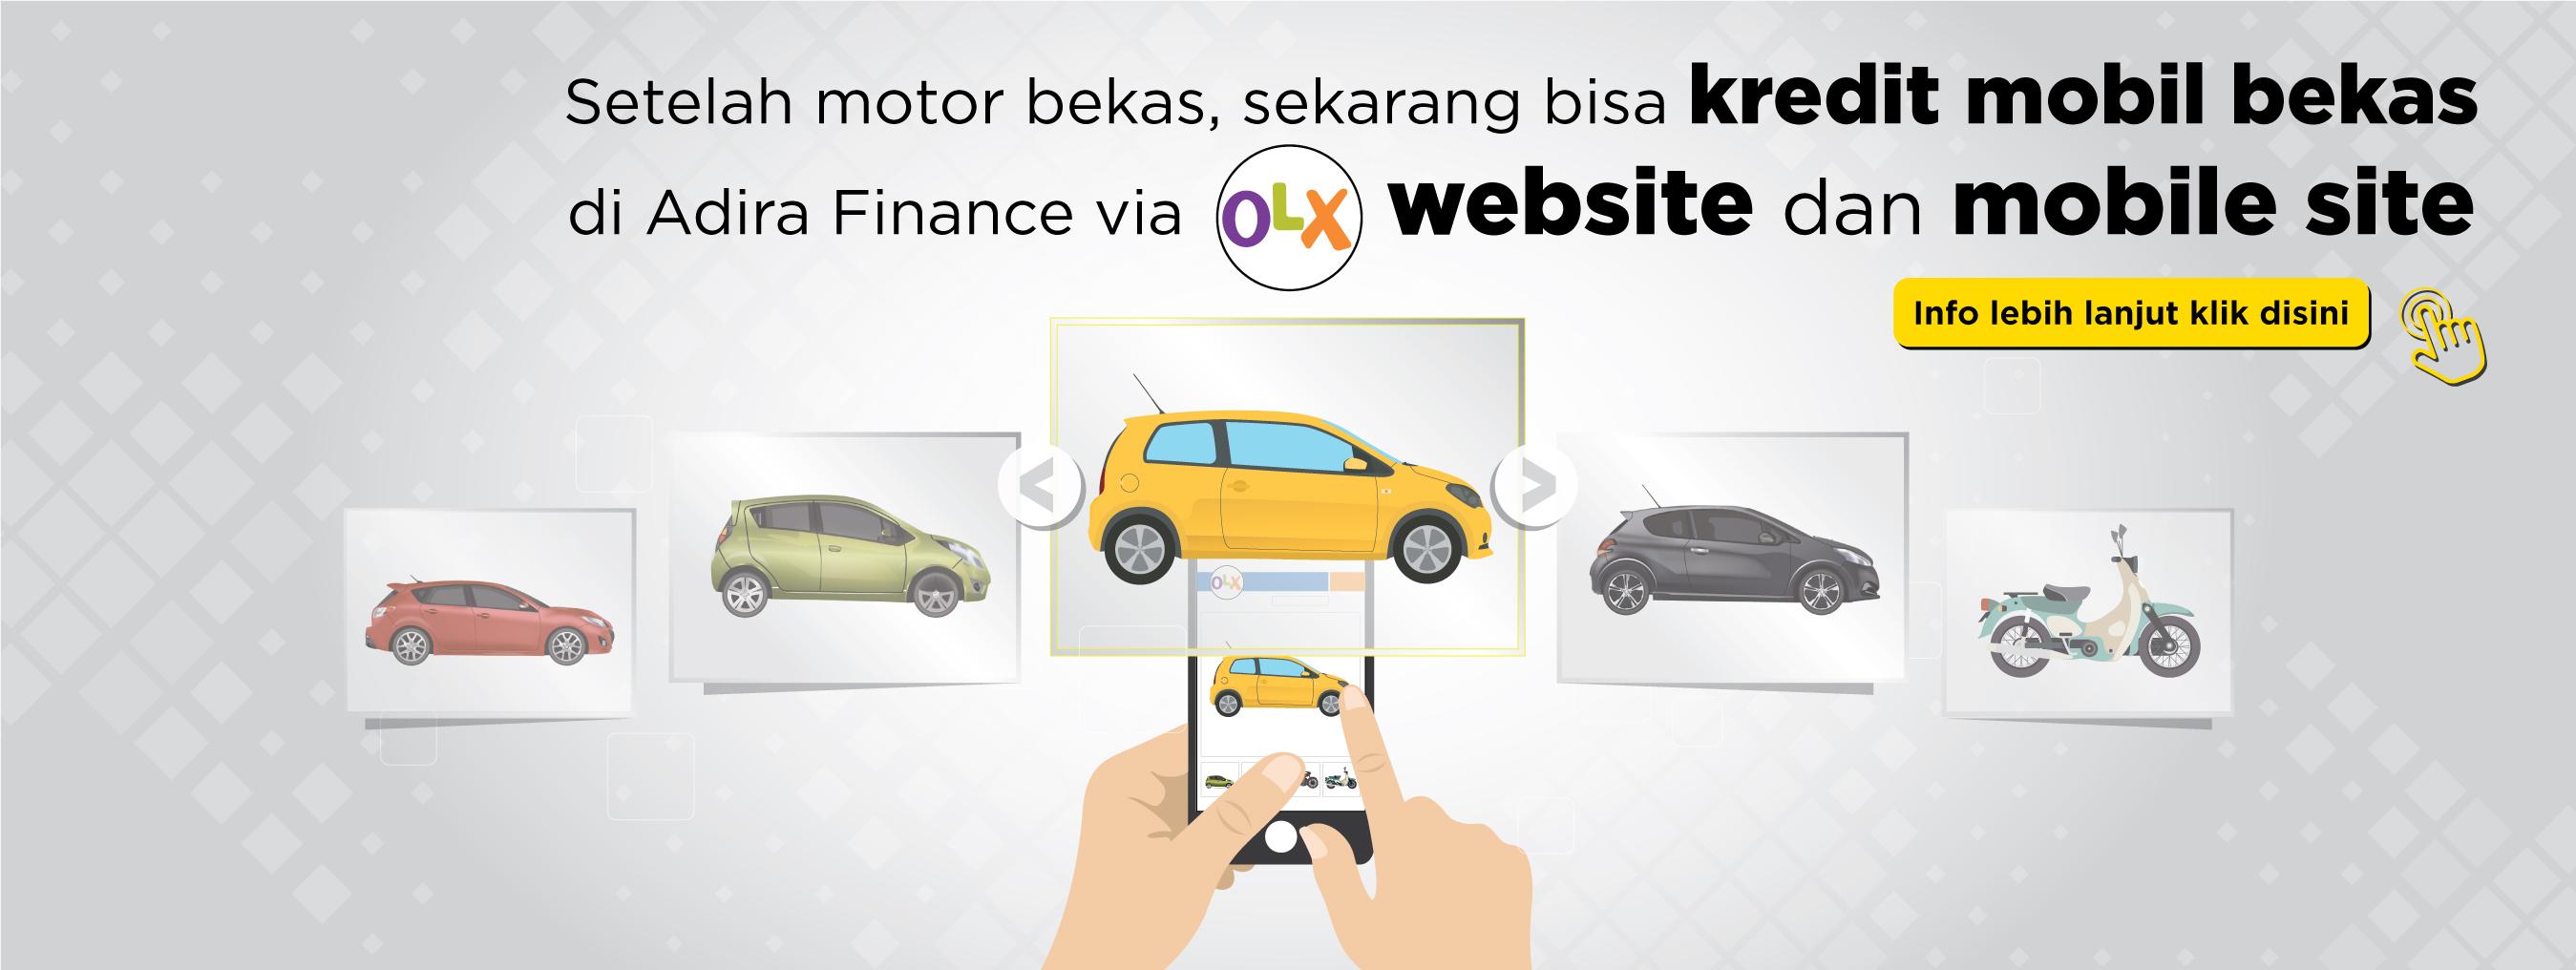 OLX Mobil